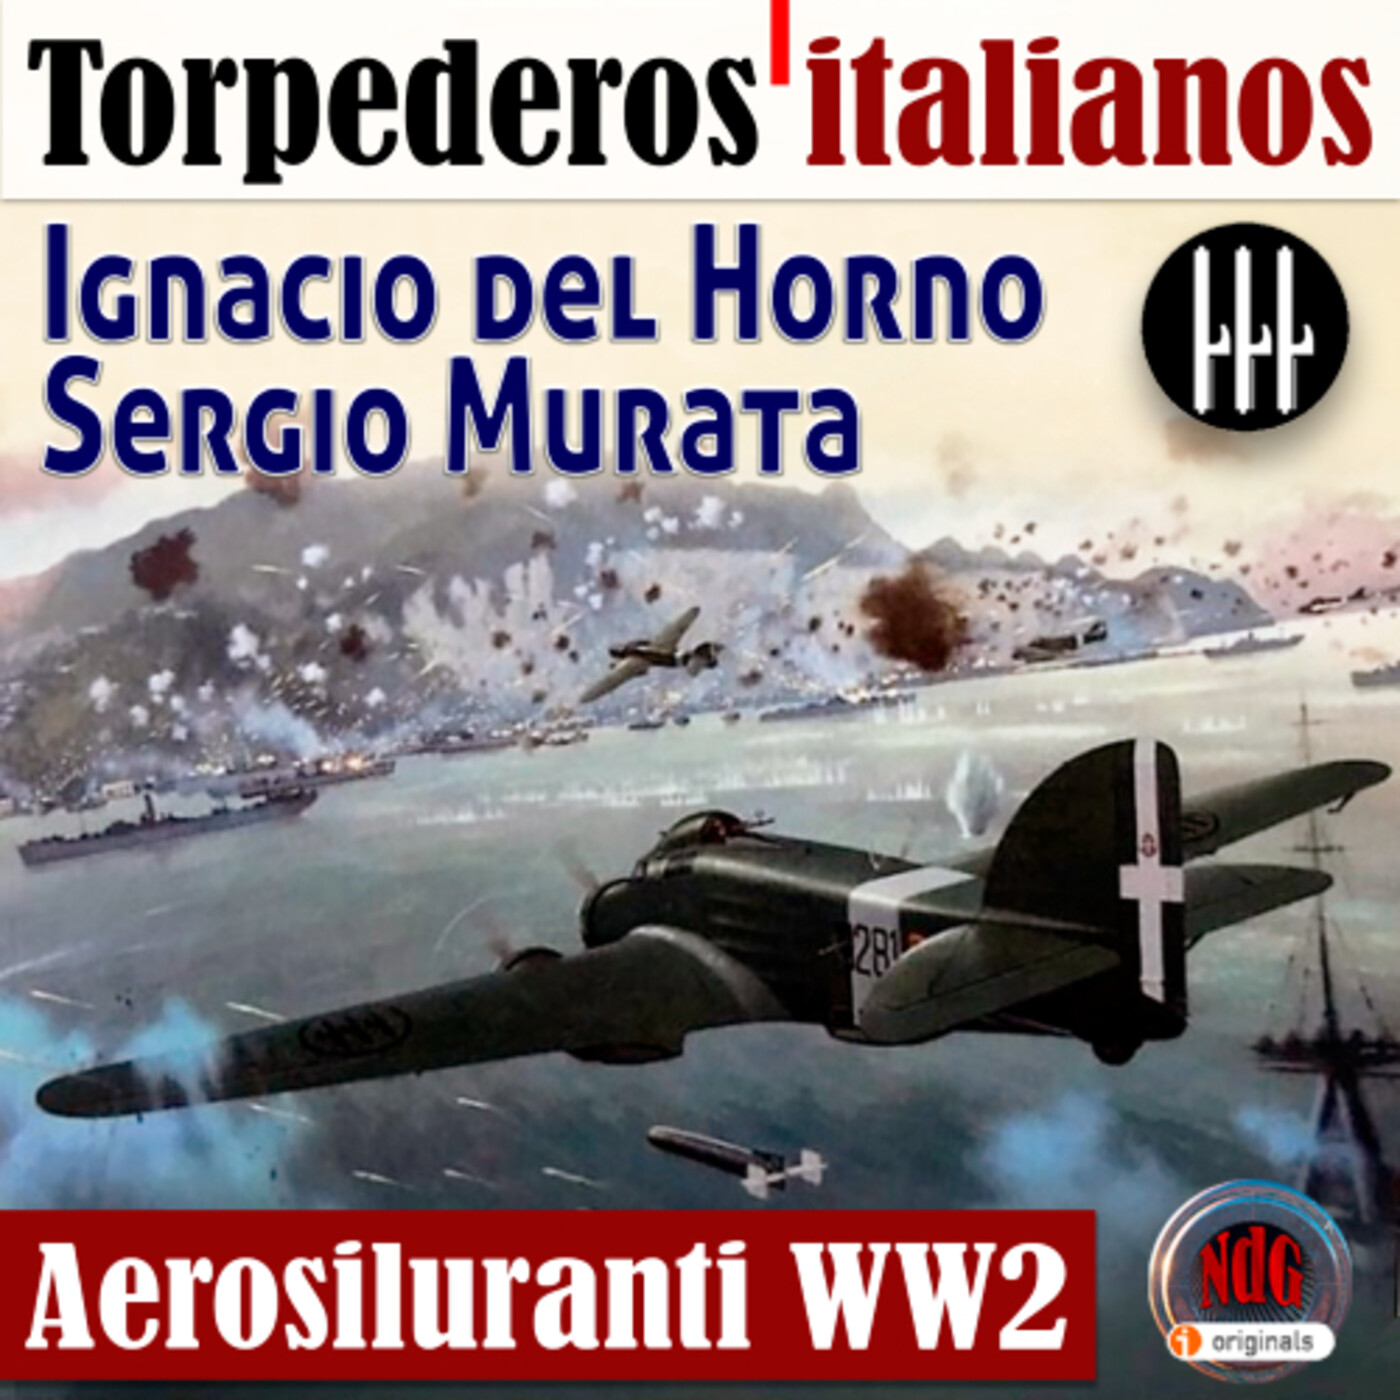 NdG #109 Aerosiluranti, Torpederos Italianos en la WW2